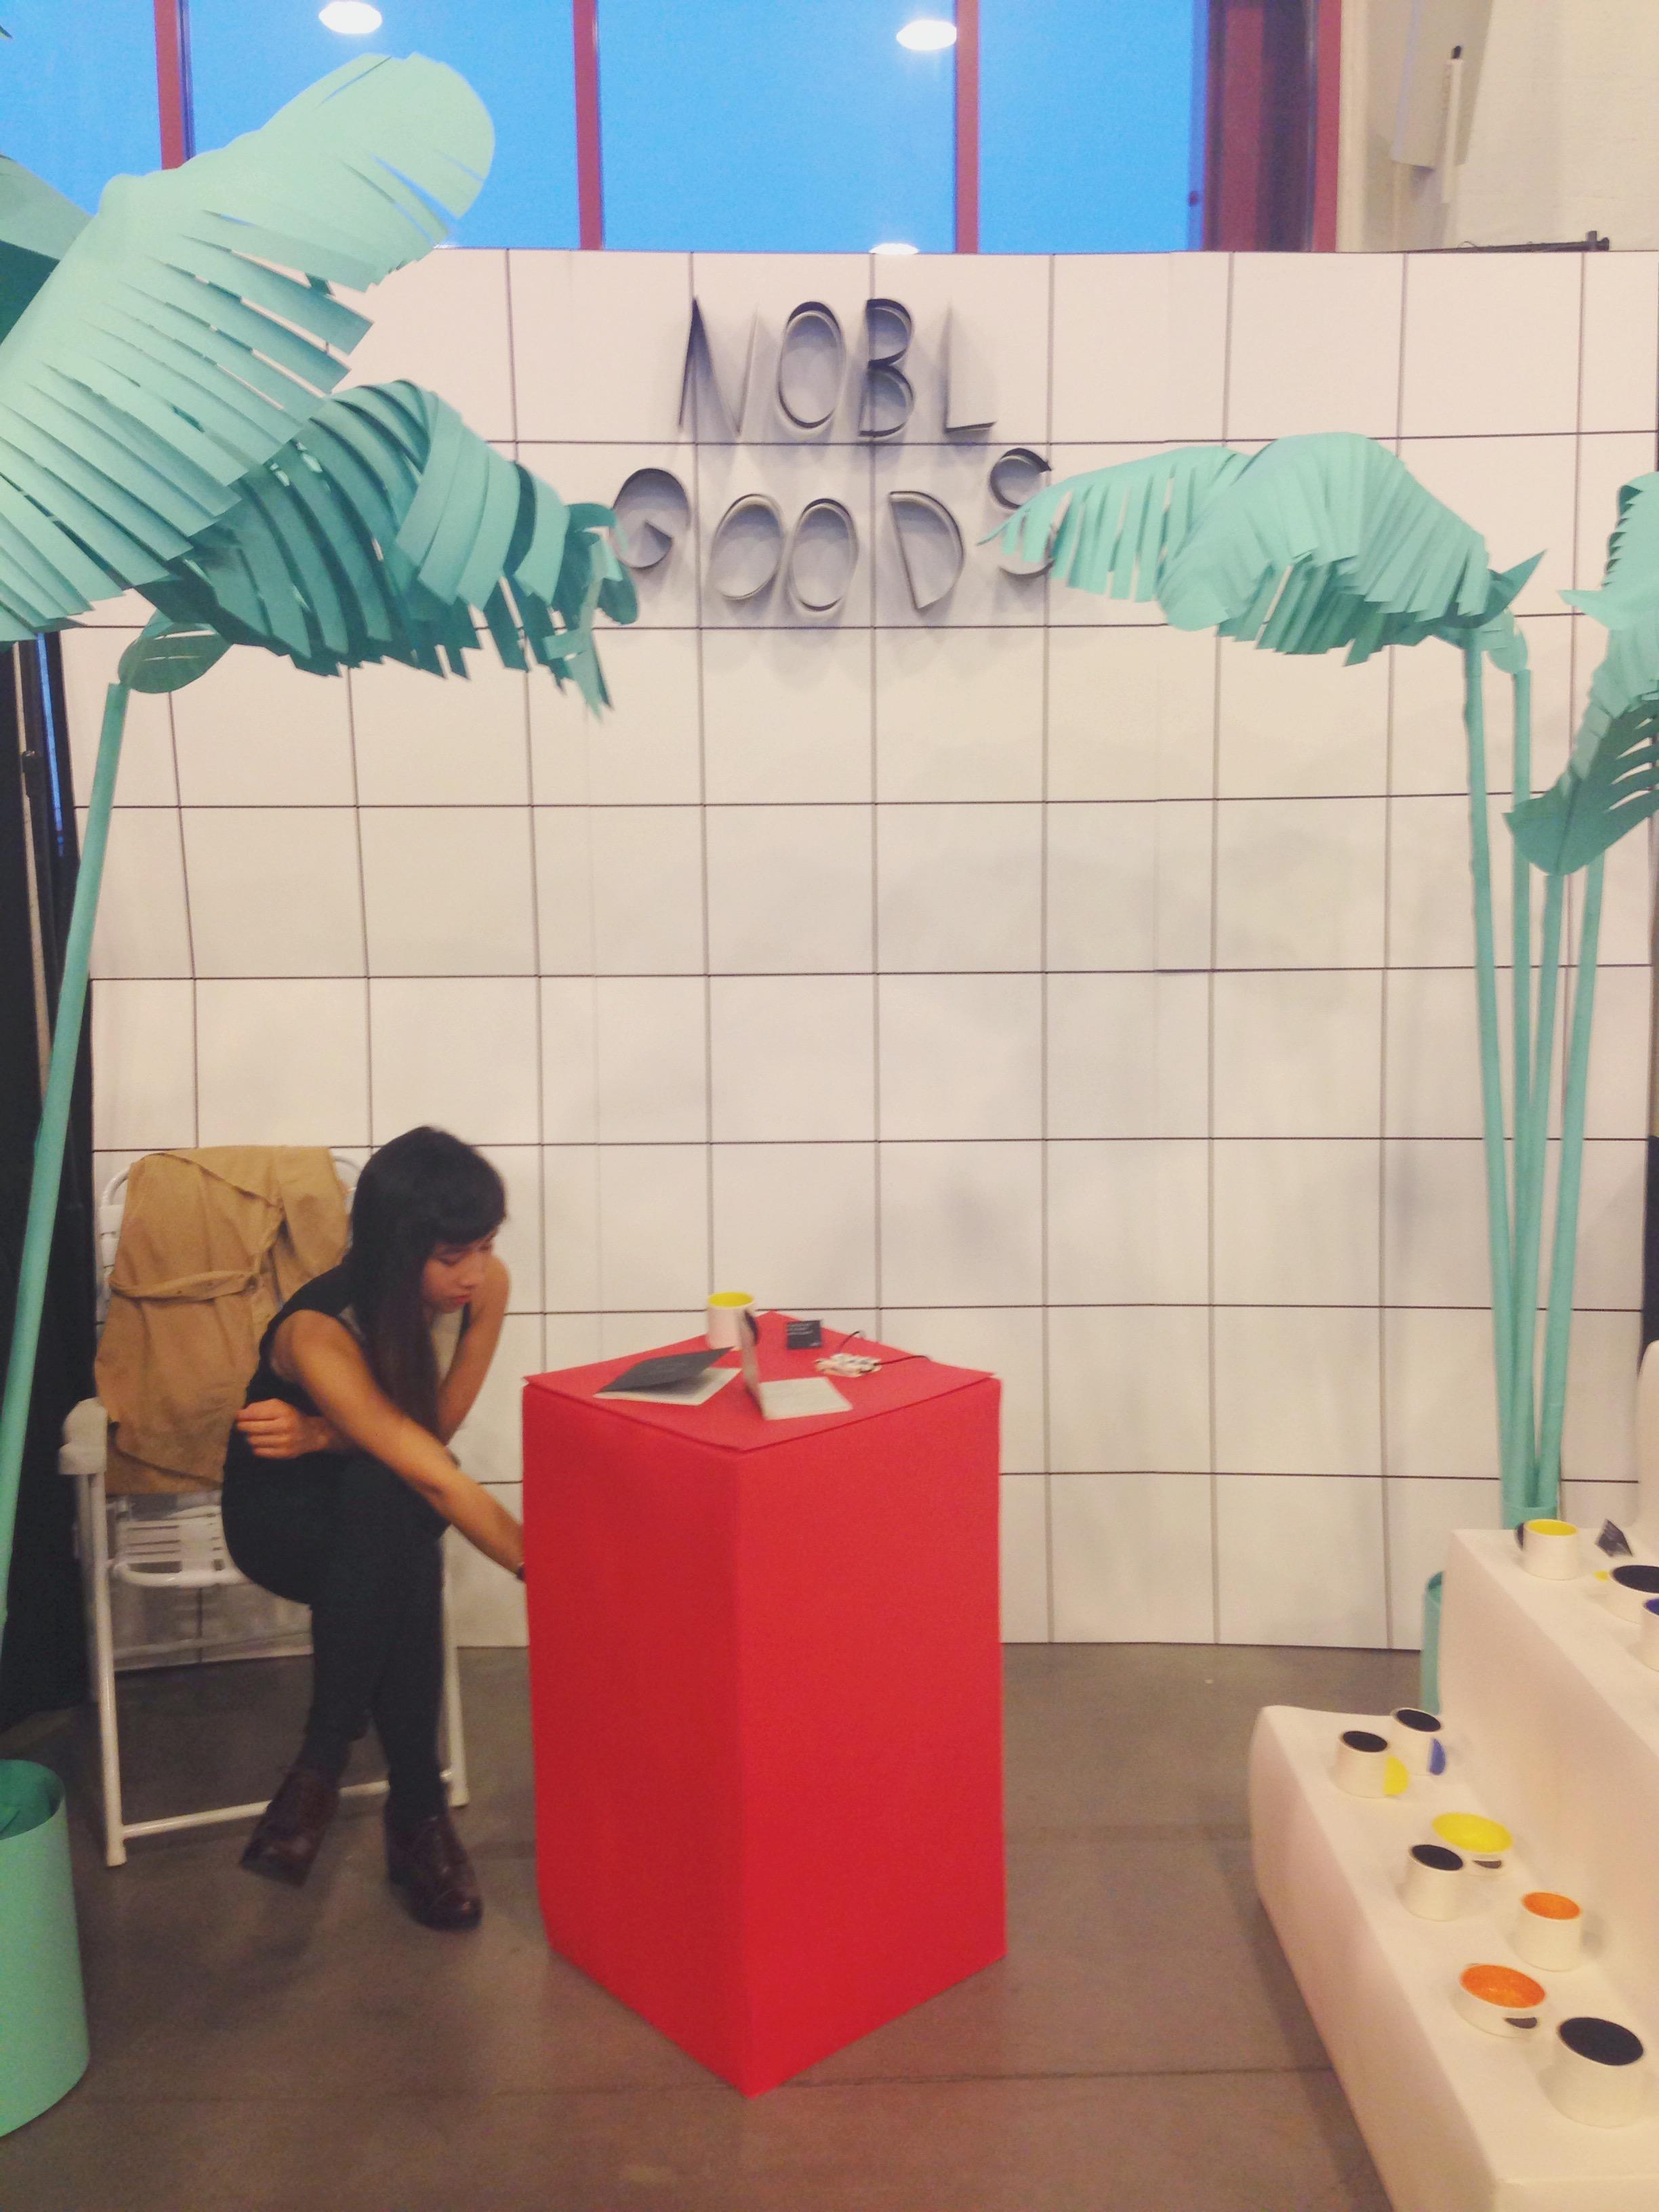 Nobl Goods